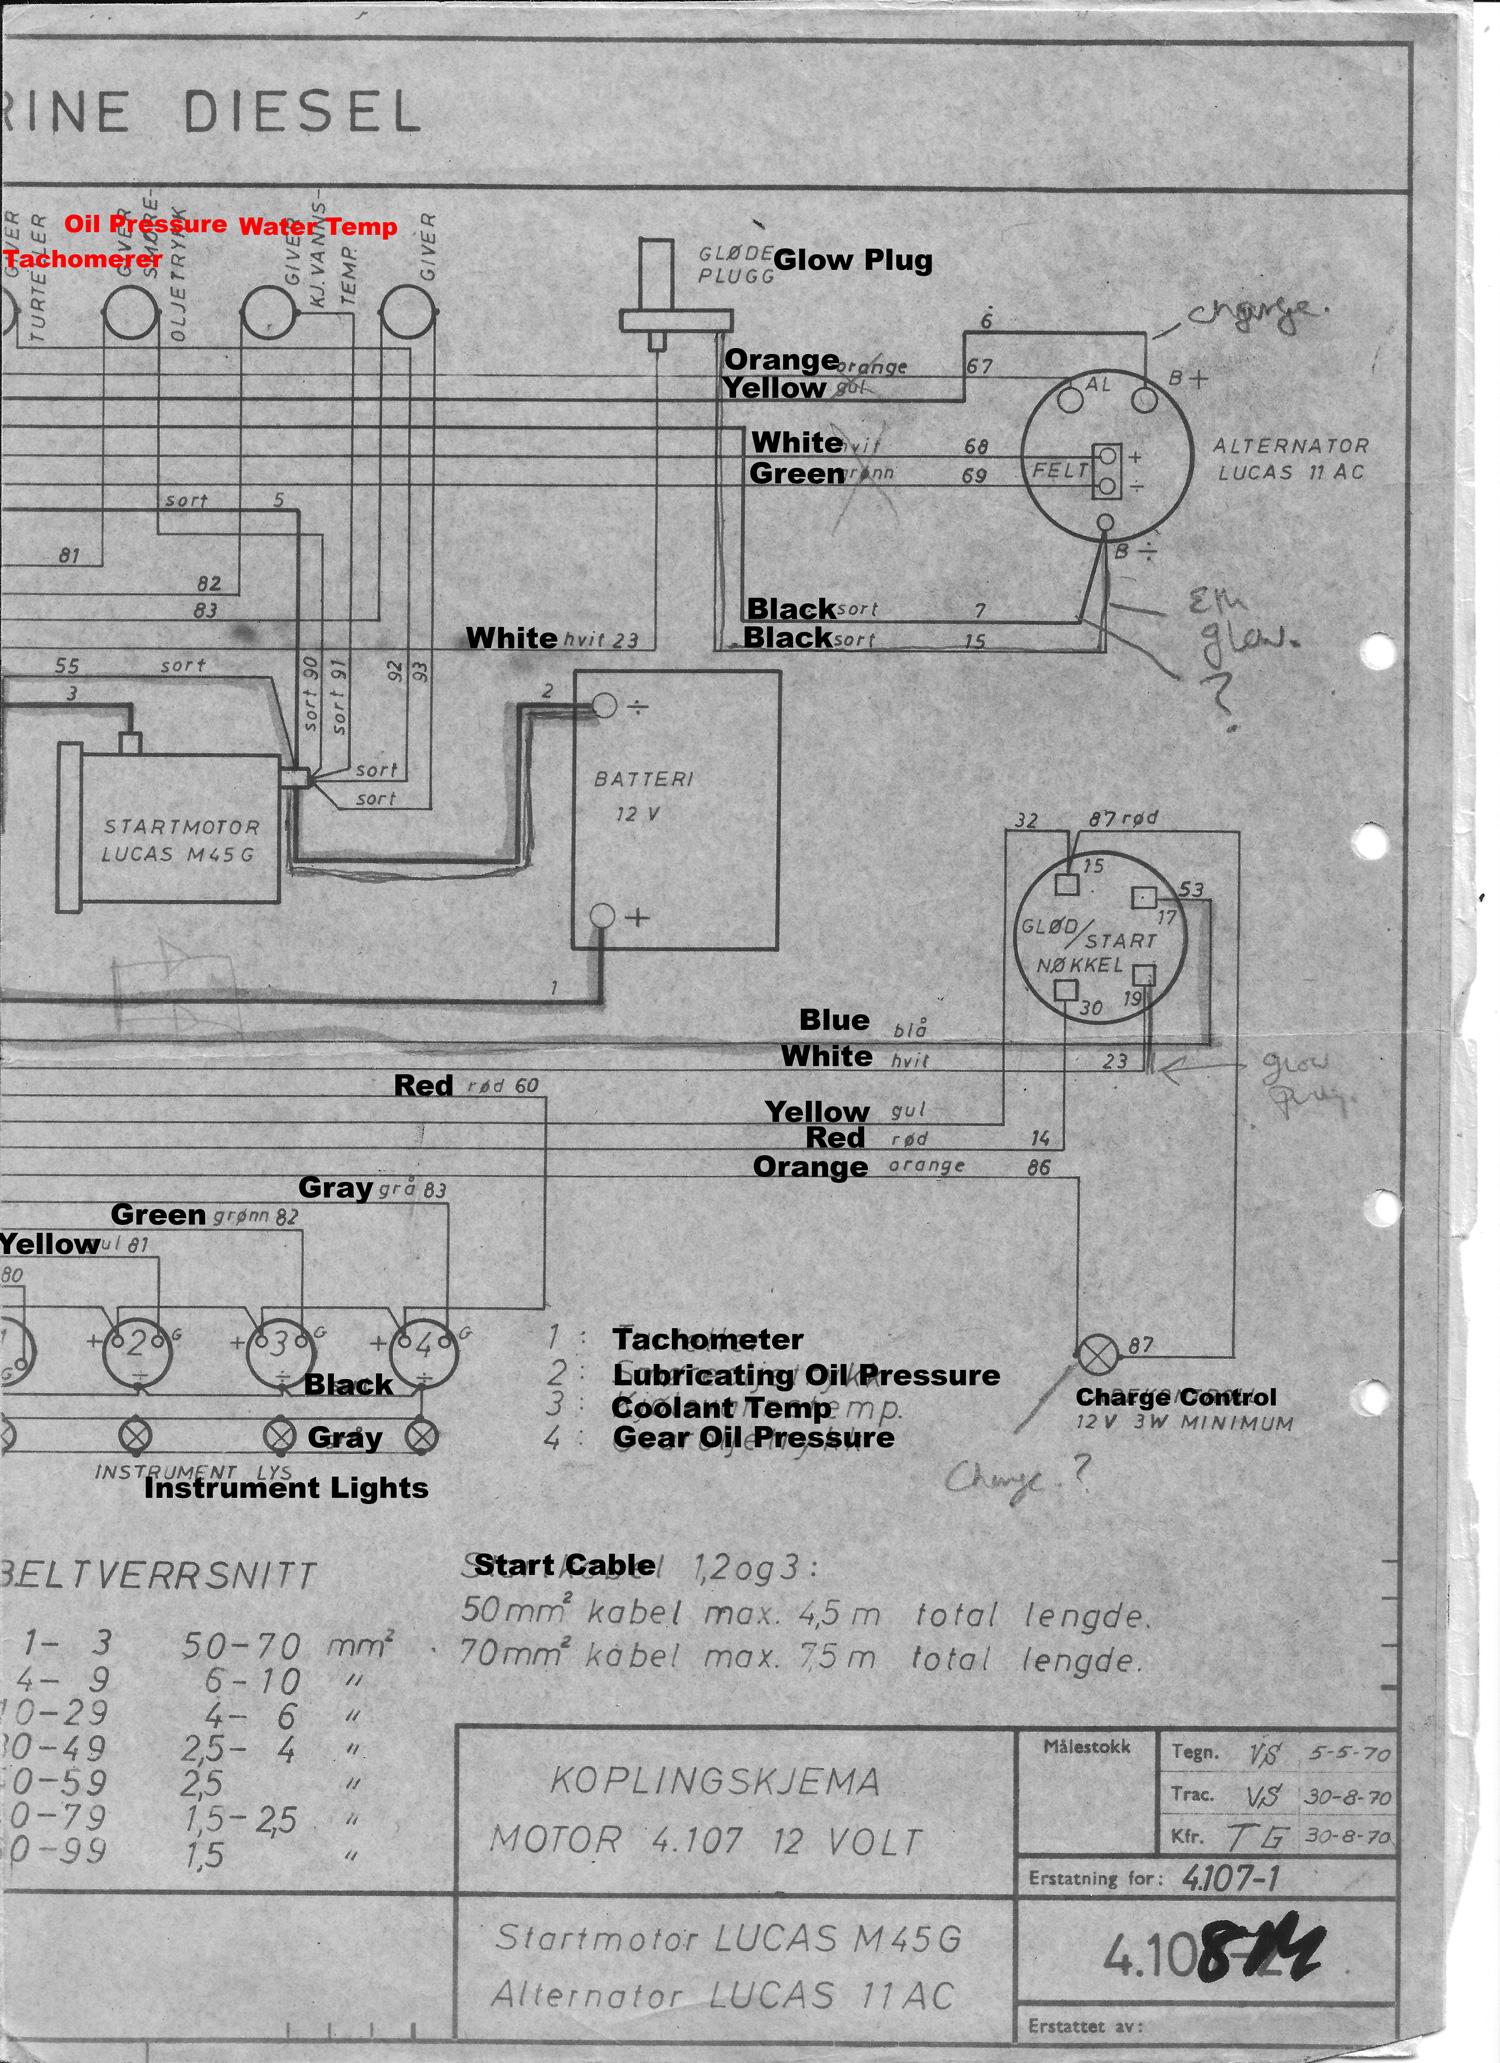 2004 vw touareg wiring diagram msd 6m 2 2005 engine imageresizertool com